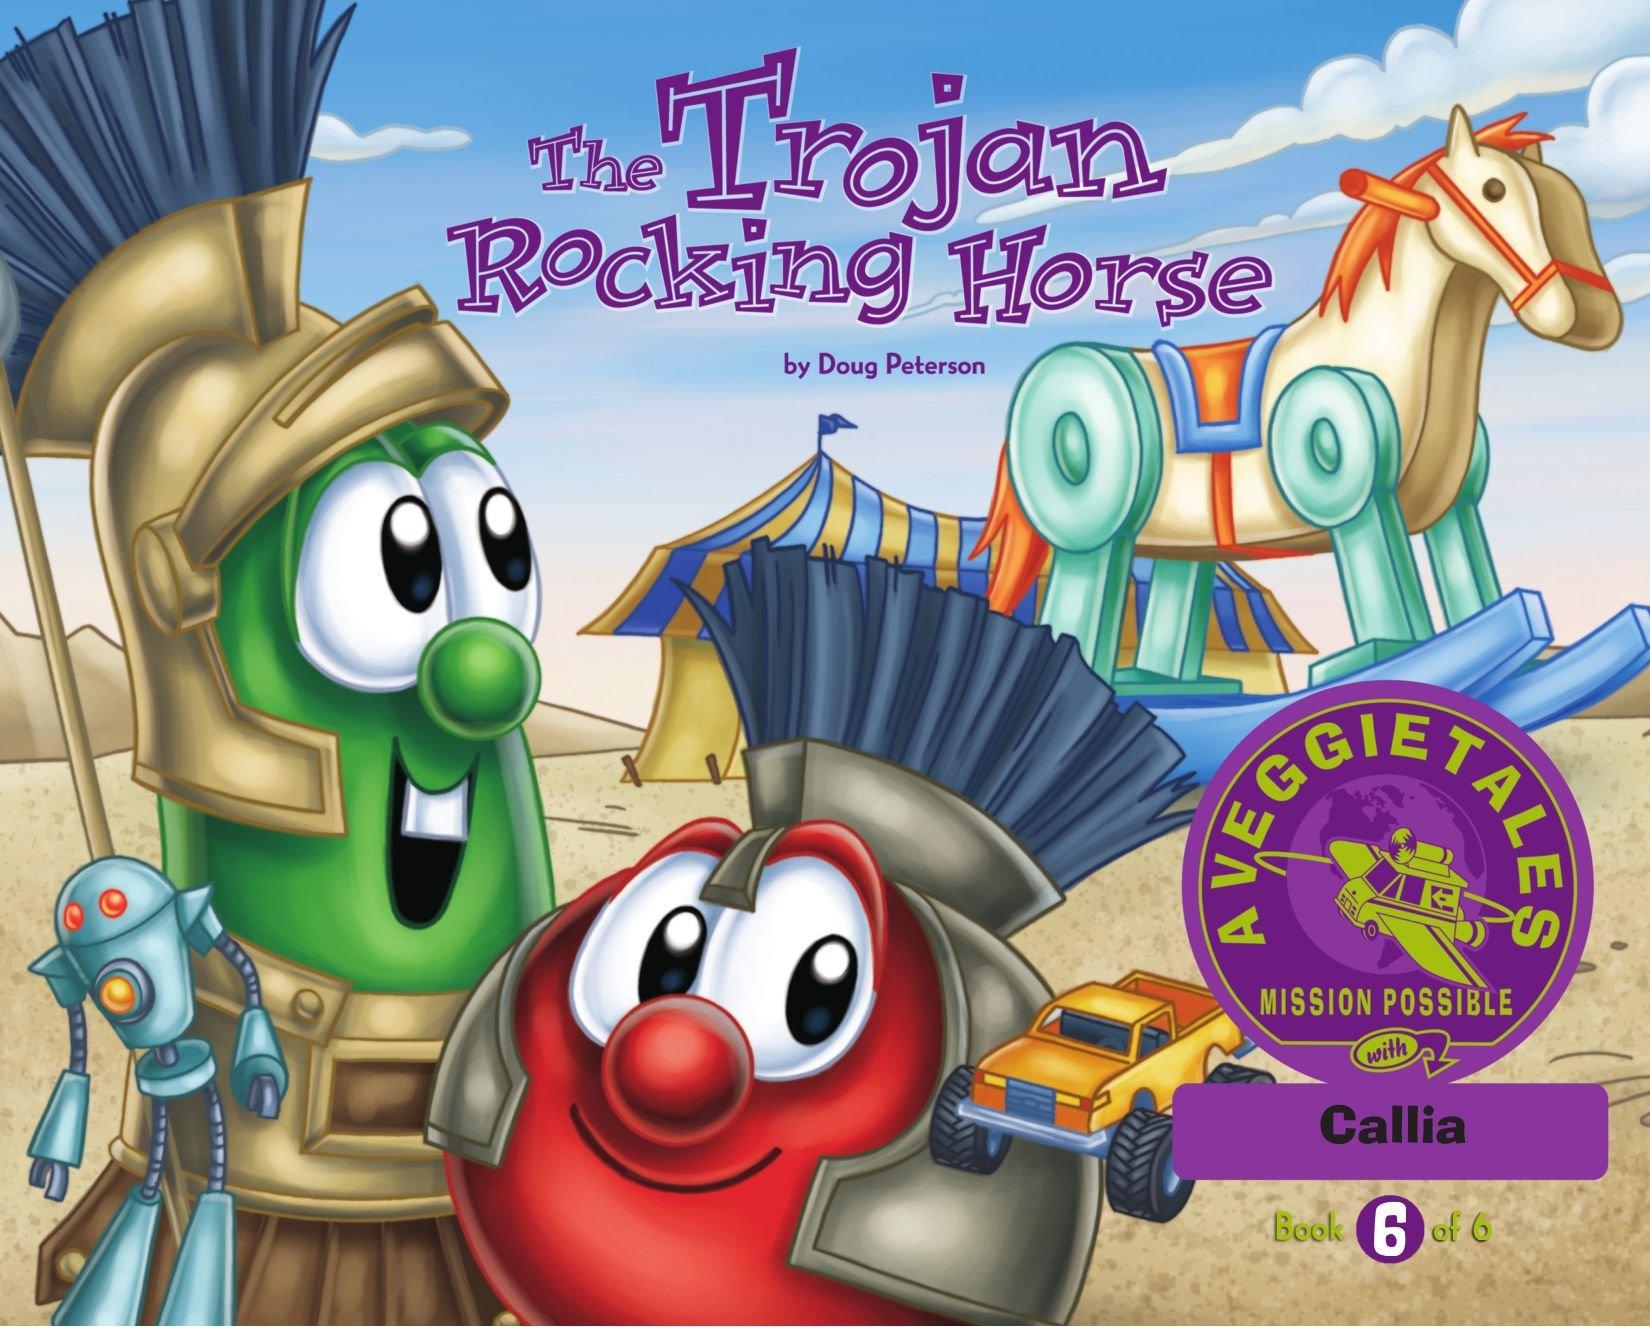 The Trojan Rocking Horse - VeggieTales Mission Possible Adventure Series #6: Personalized for Callia (Girl) PDF